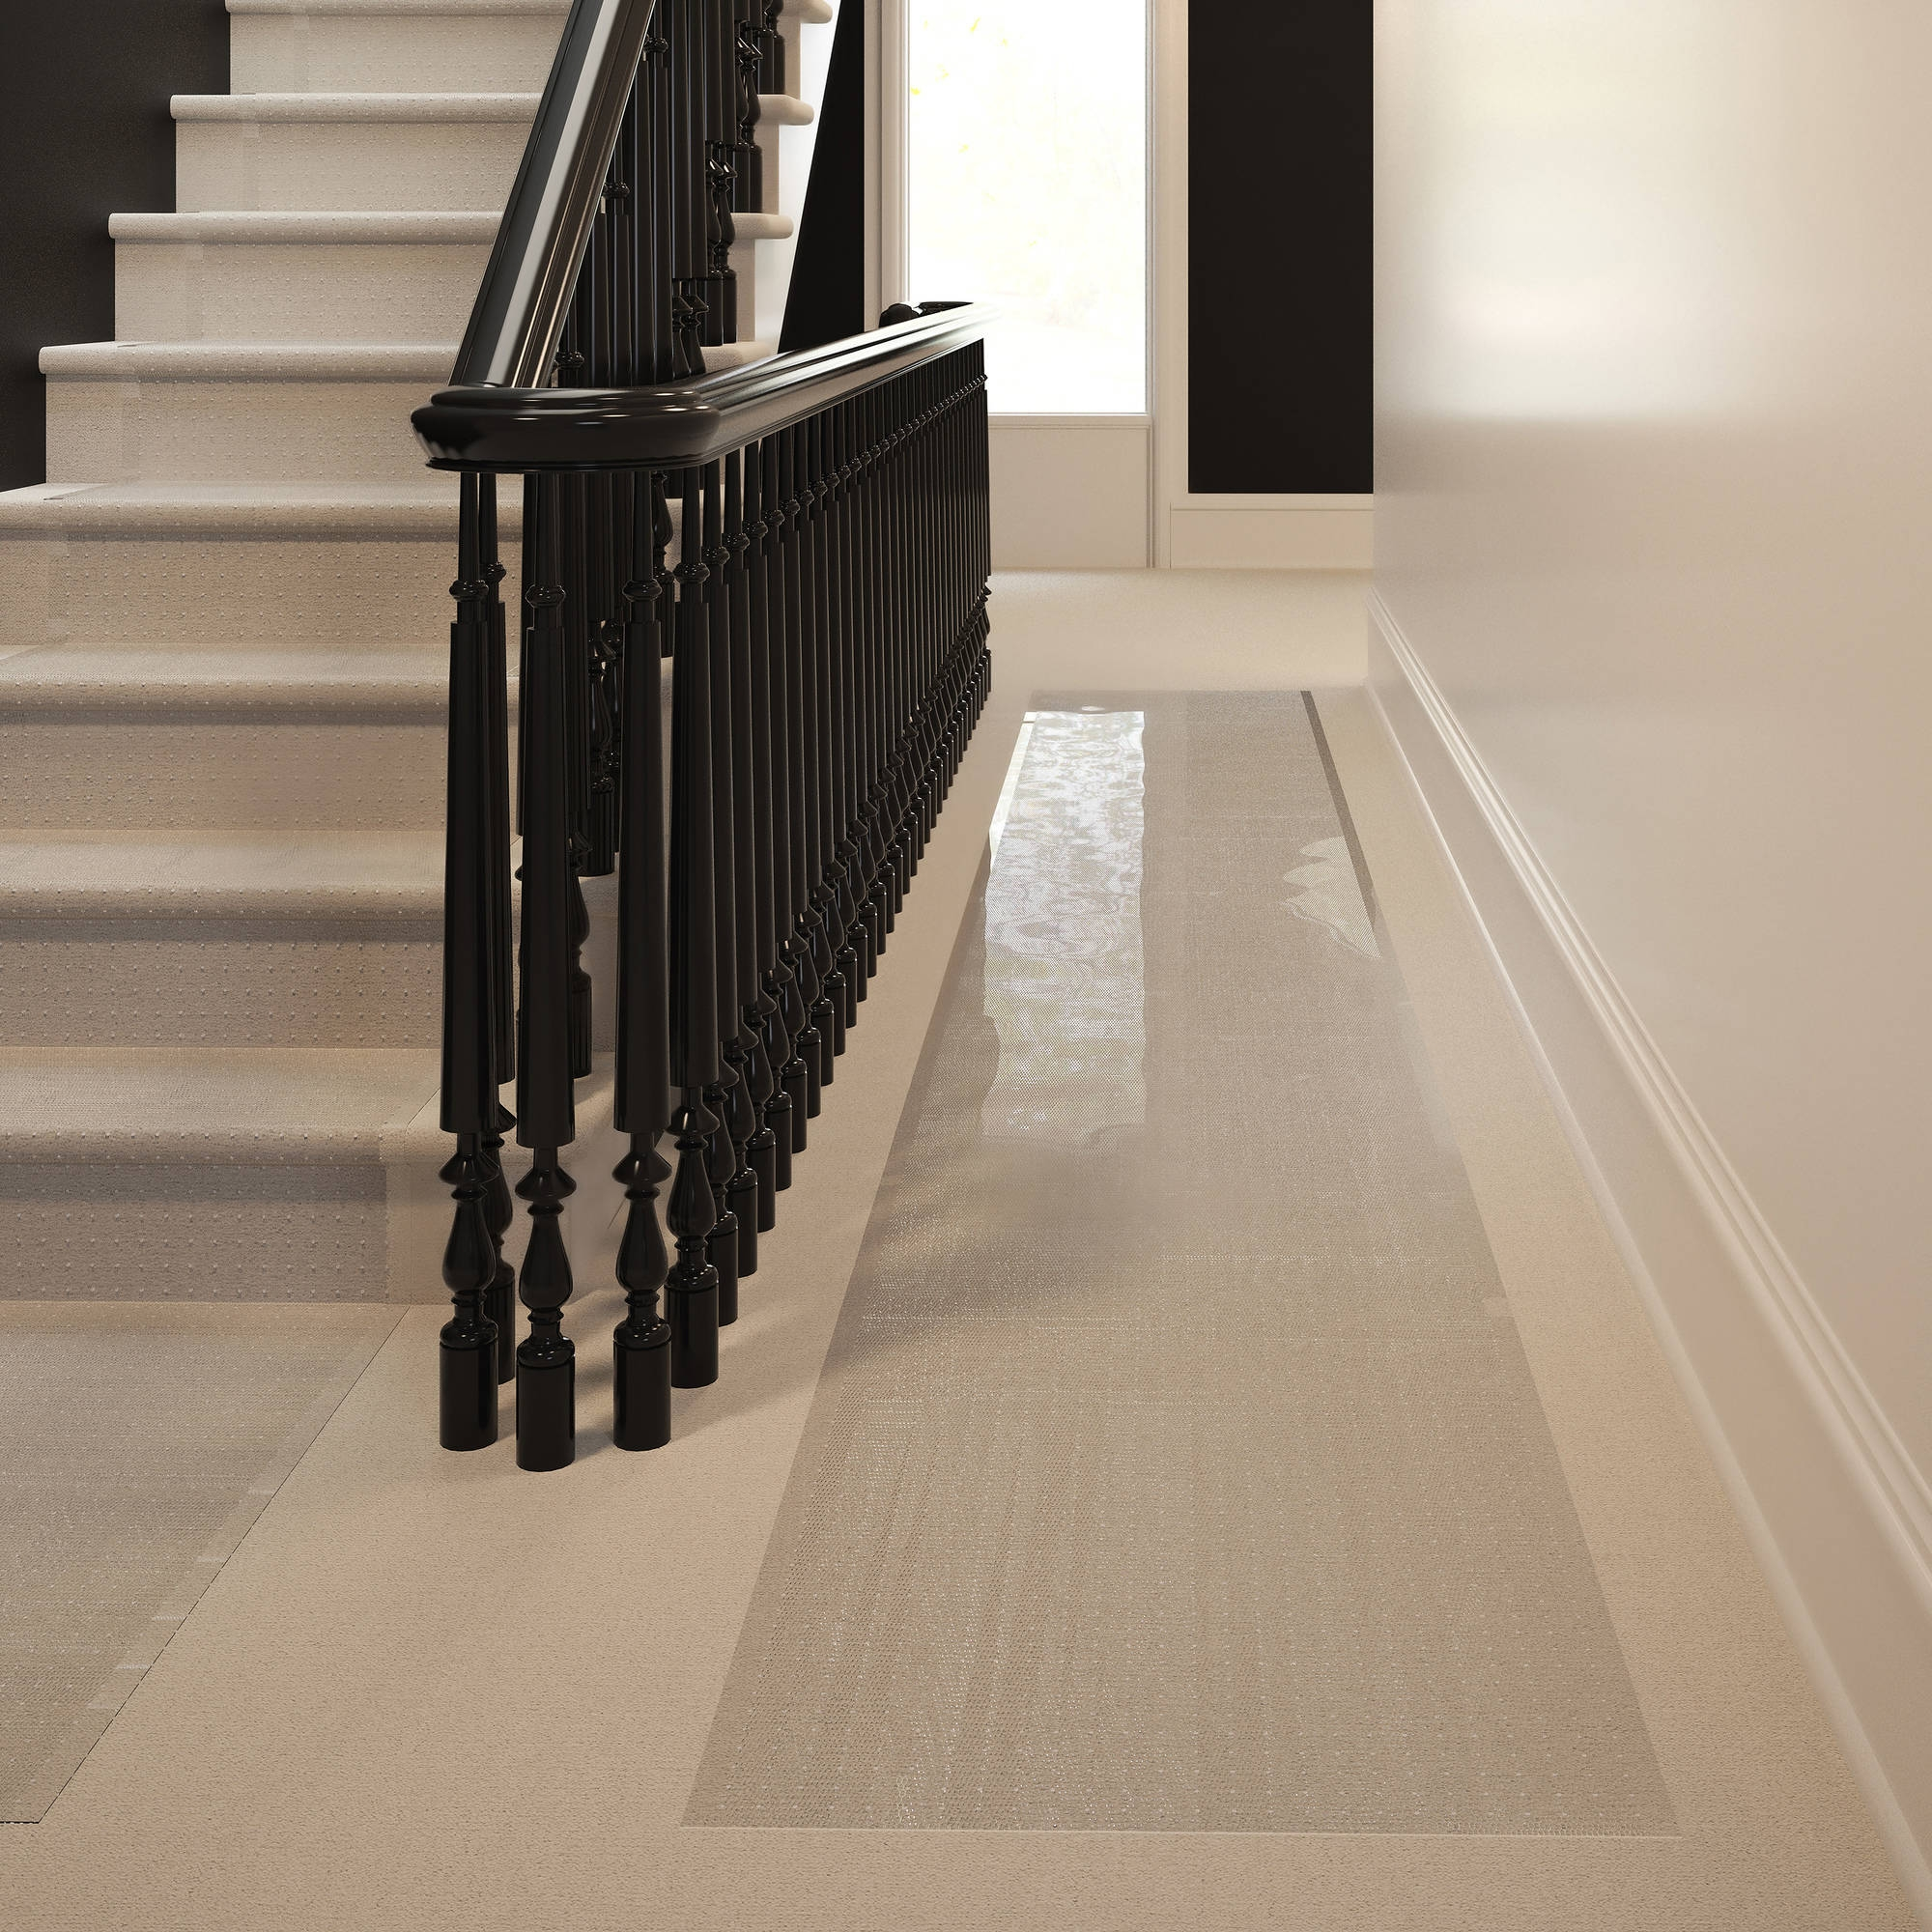 Clear Vinyl Carpet Protector Runner